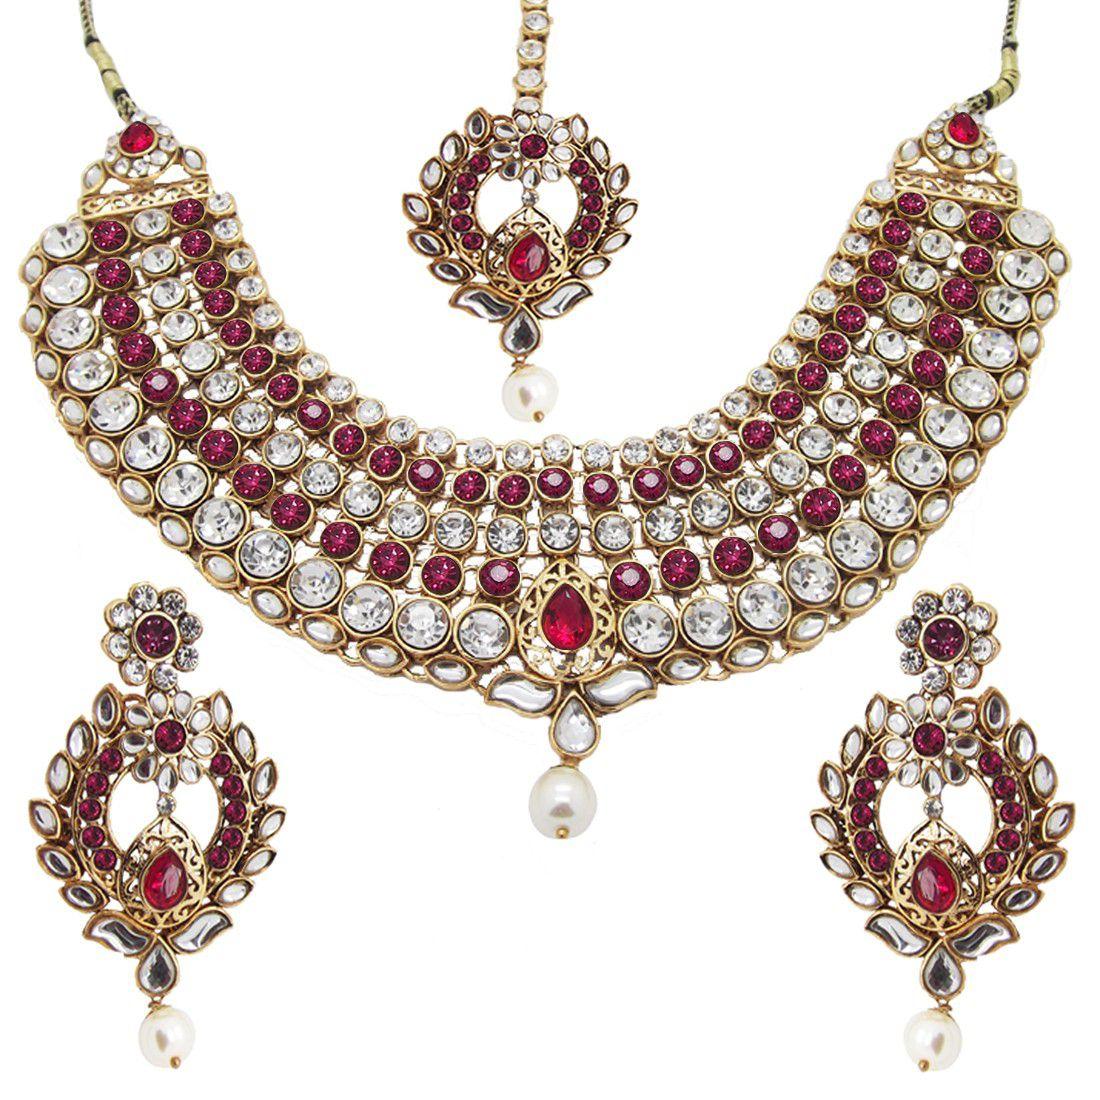 NAMI Dark Pink Bridal Statement CZ Kundan Gold Plated Necklace Set